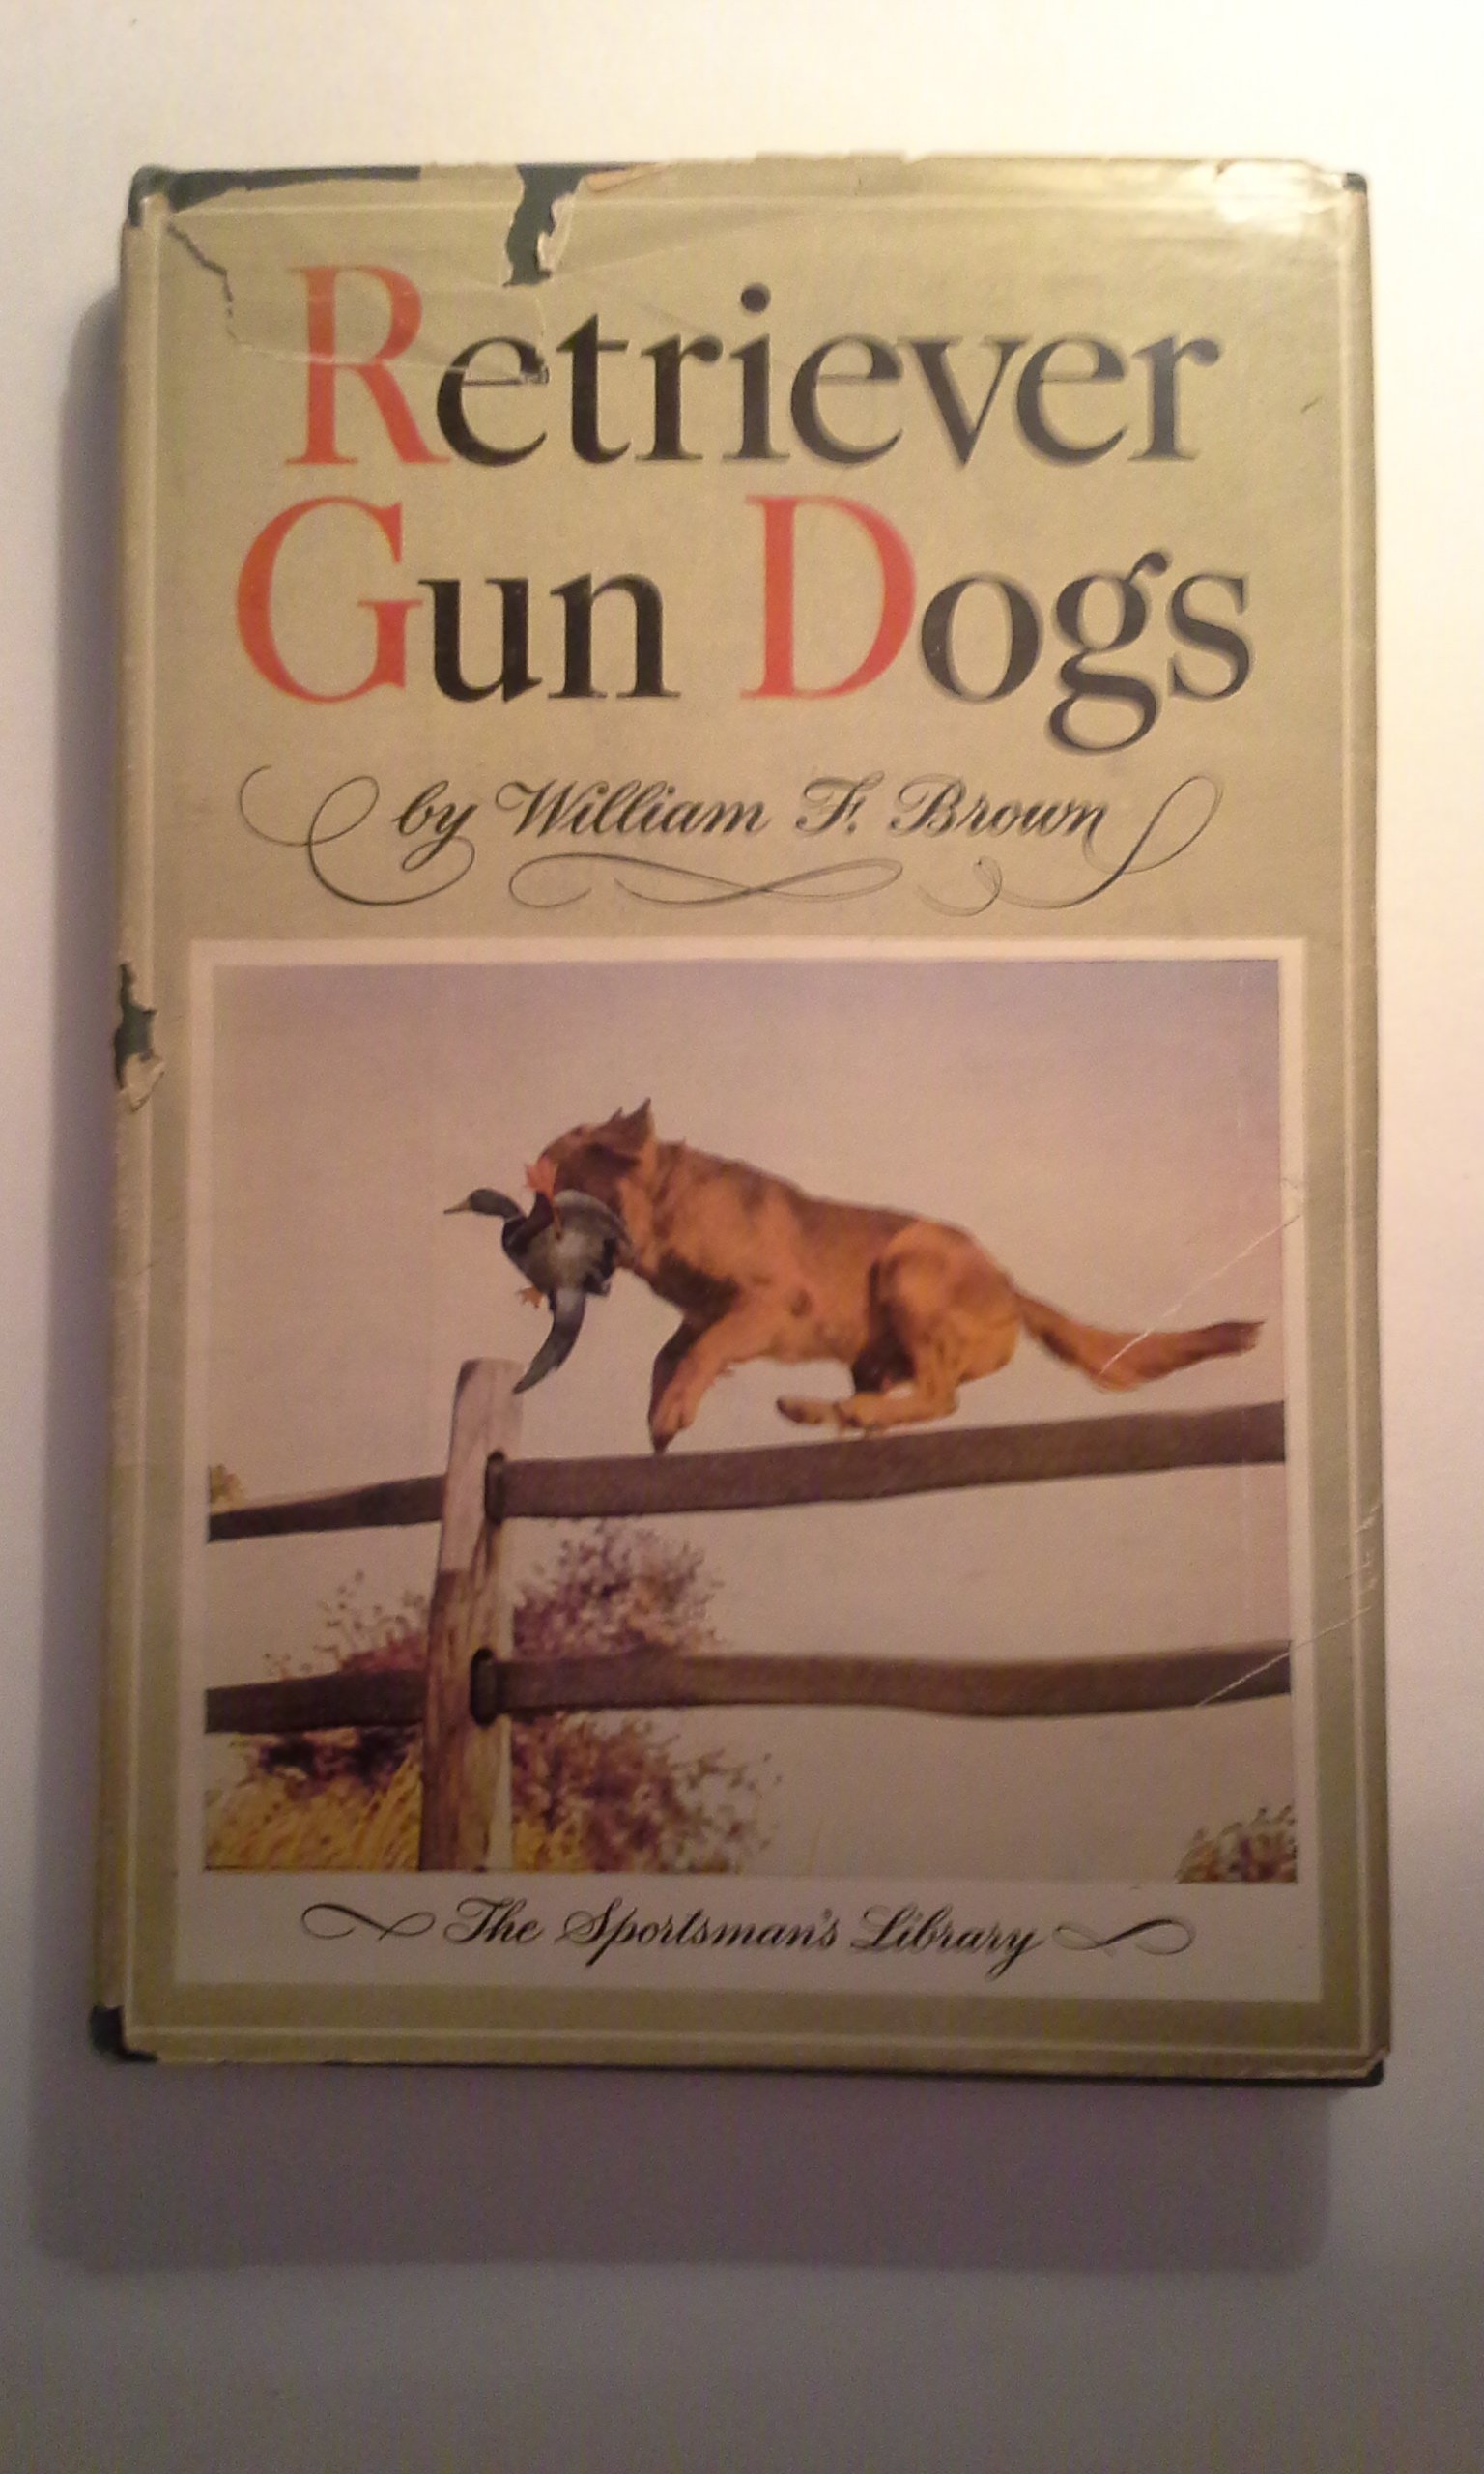 Retriever gun dogs